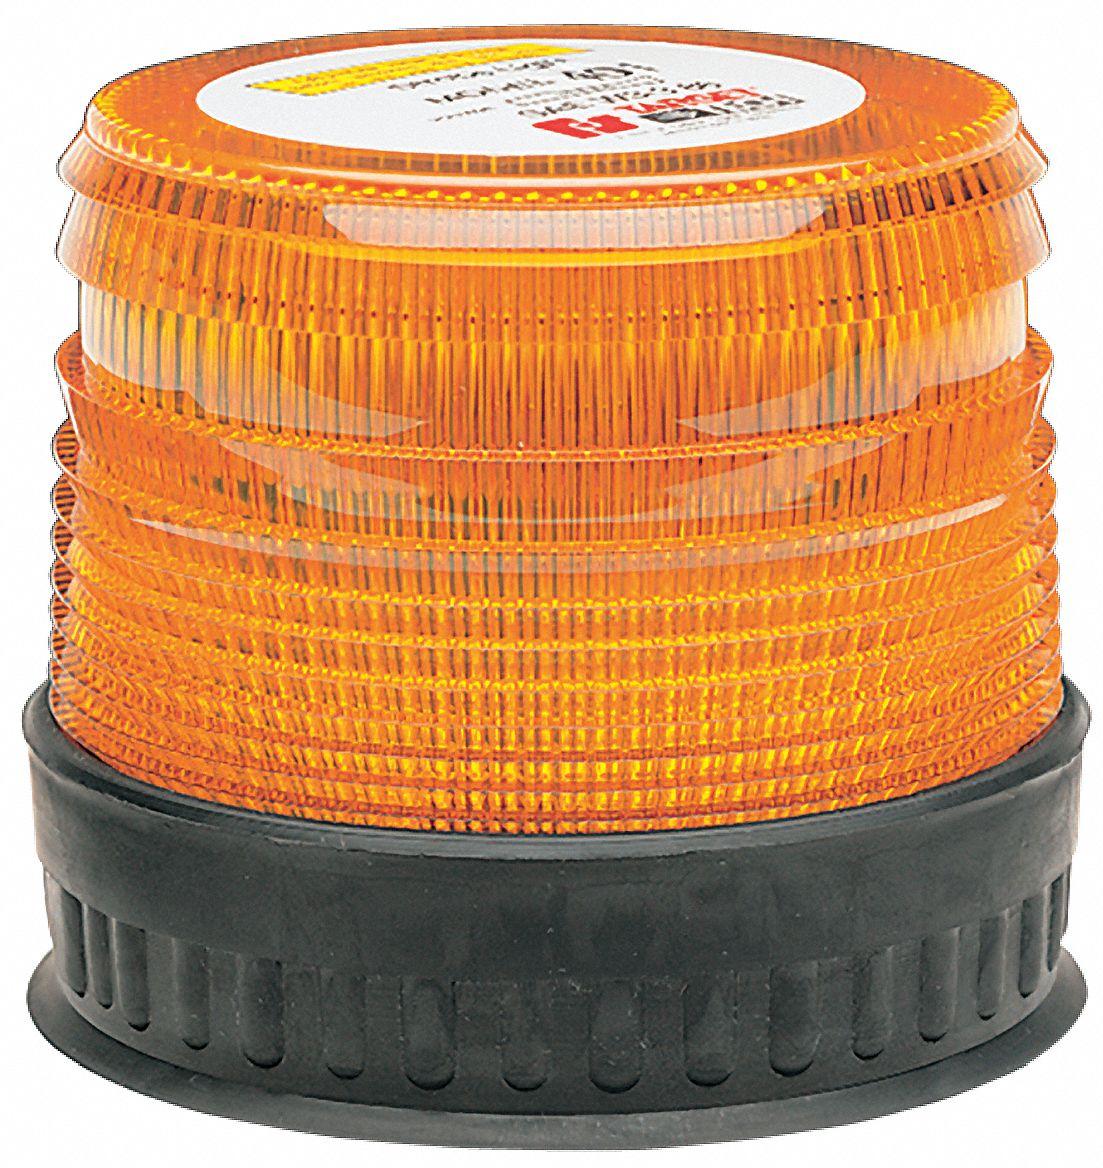 Federal Signal Strobe Light Amber Flashing 5uvl5 220300 02